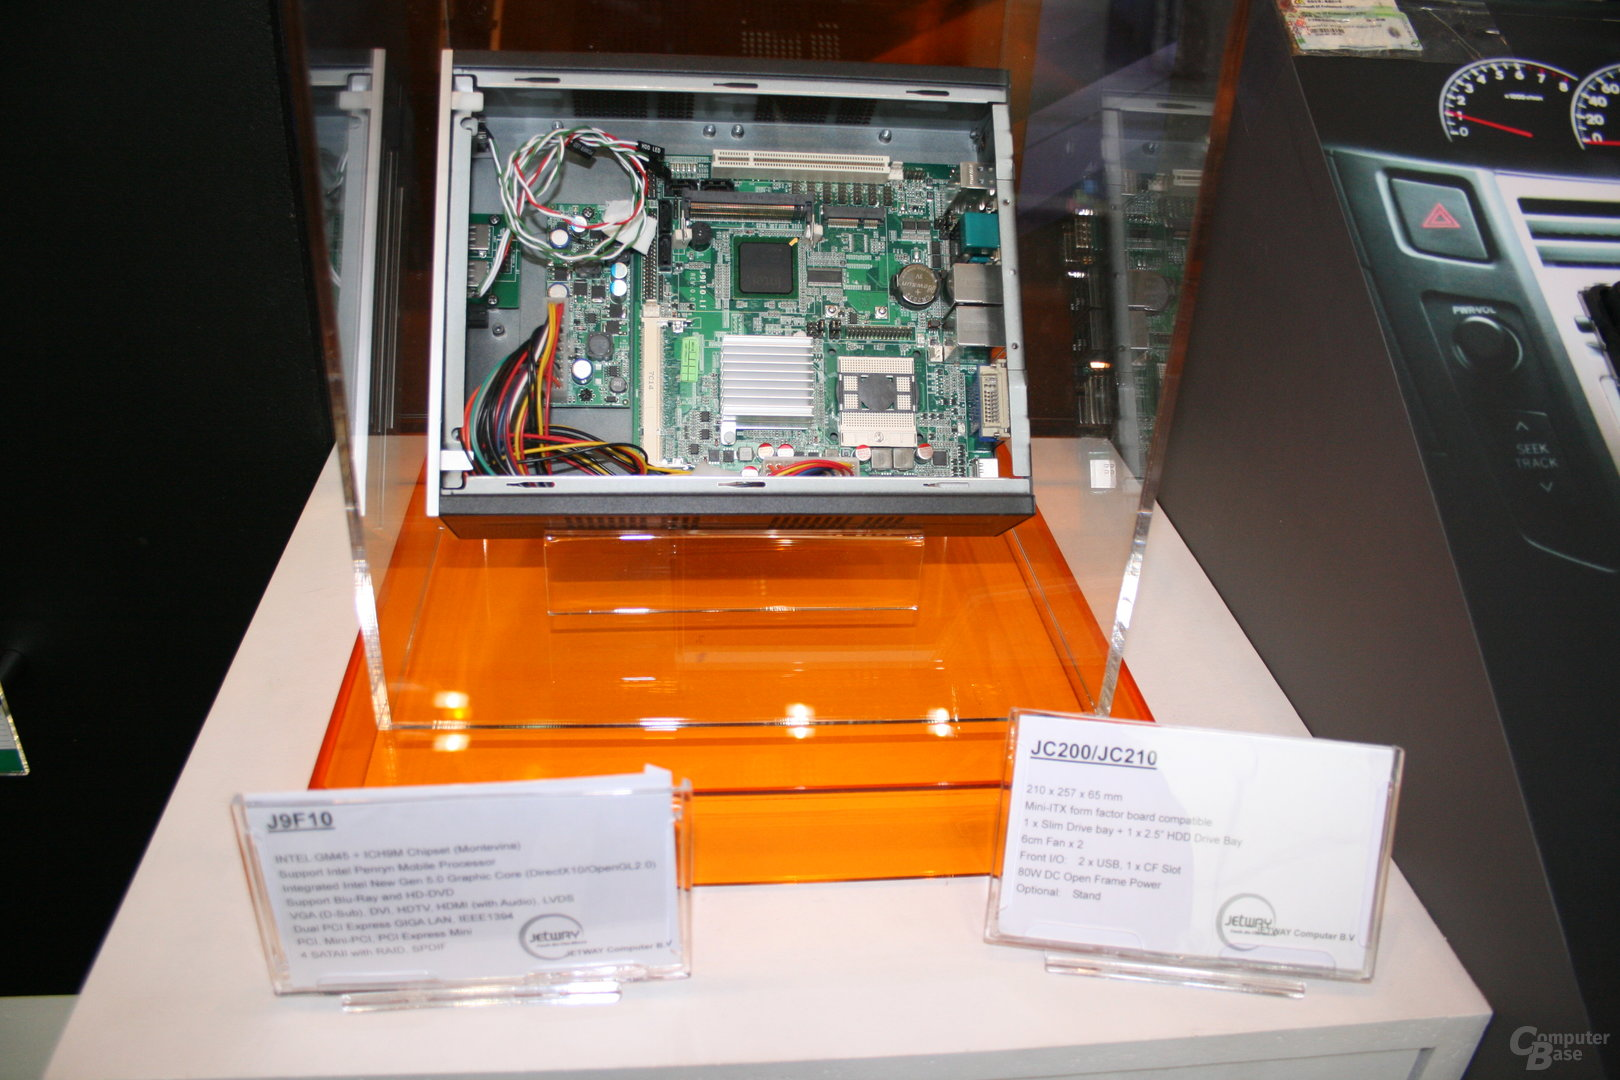 CeBIT 2008 – Jetway J9F10